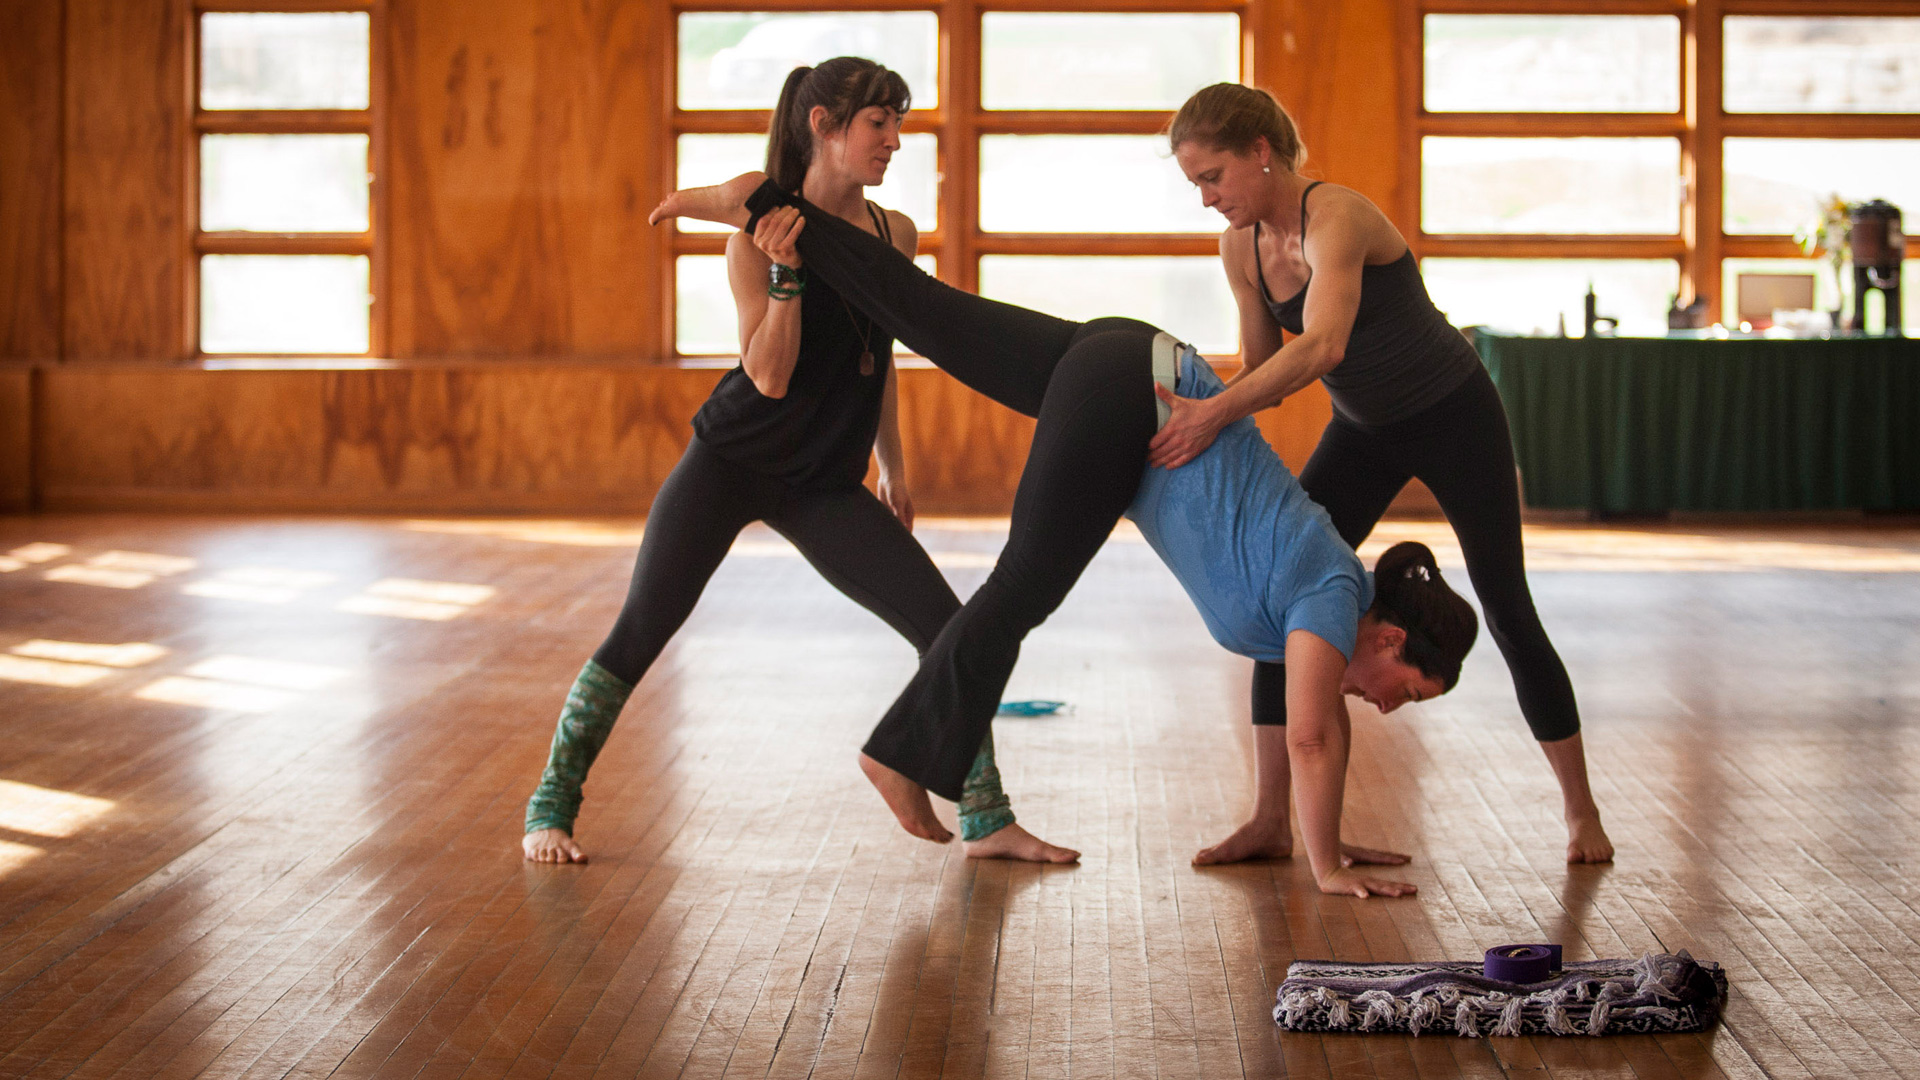 Sara strother yoga main